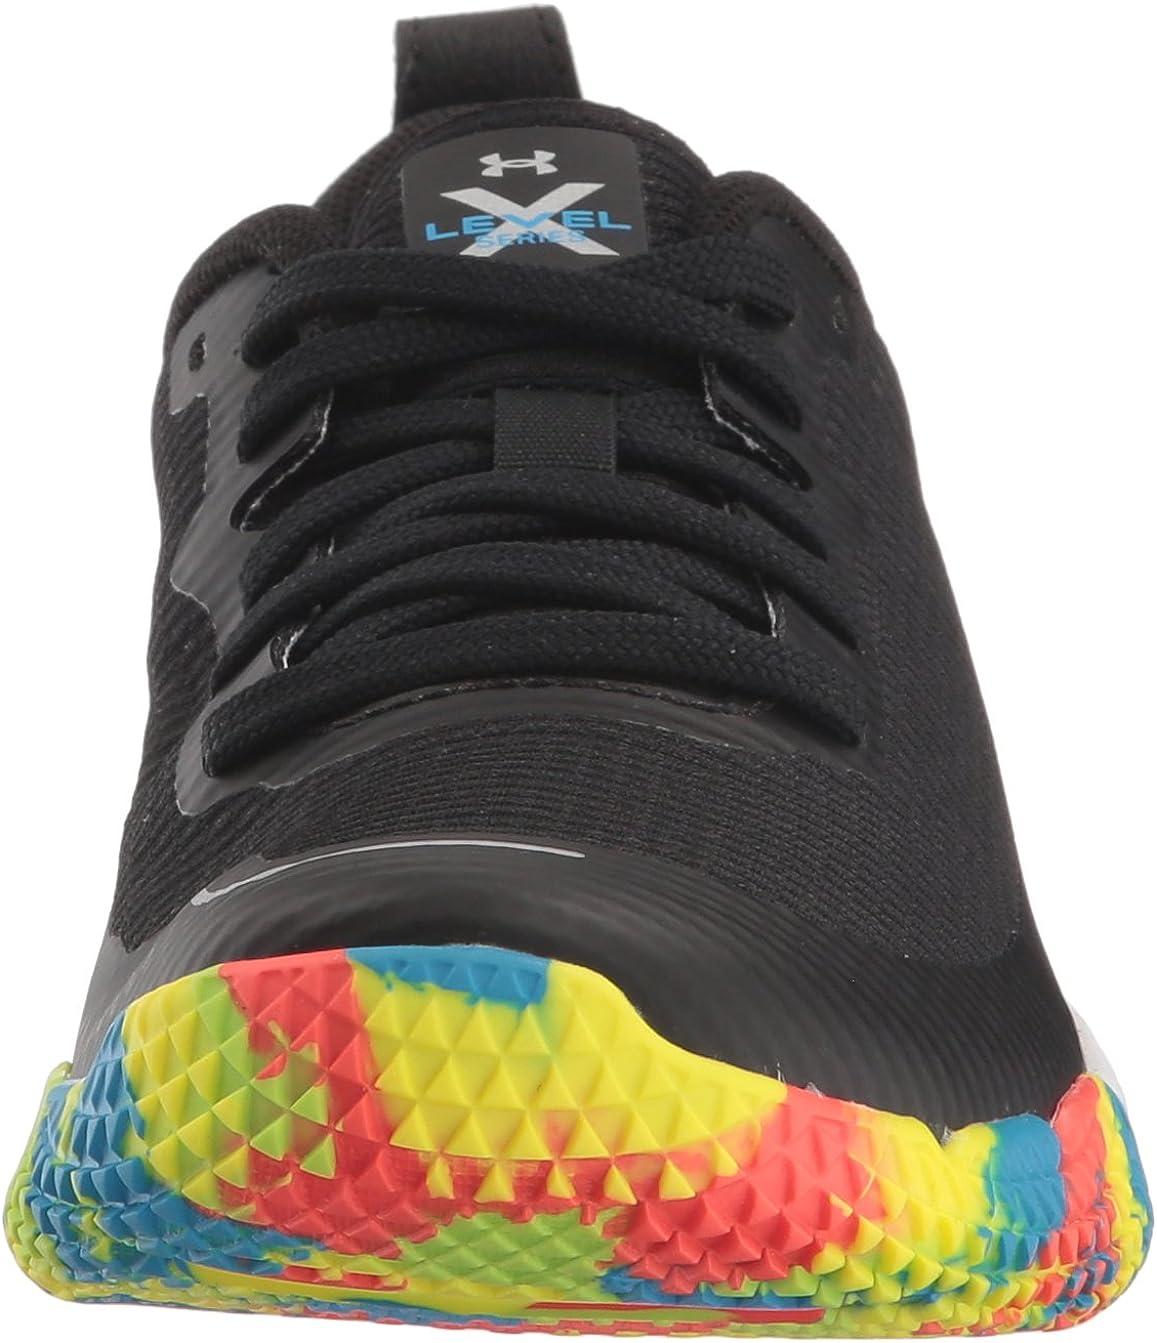 Under Armour Kids Grade School X Level Mainshock Sneaker